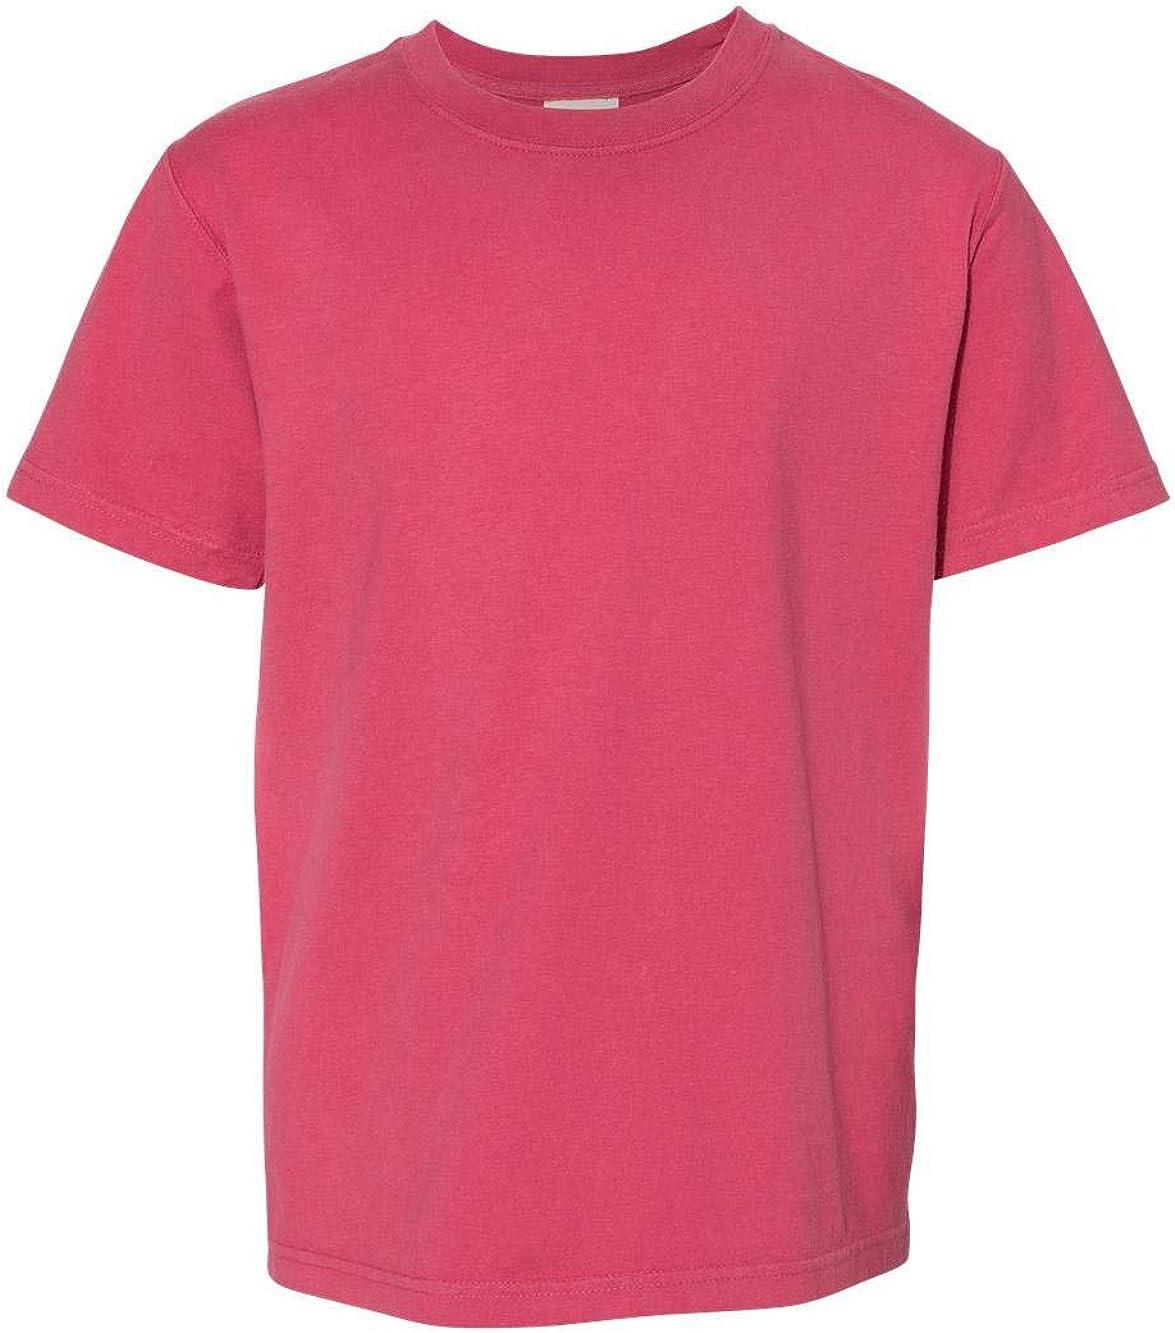 Hanes ComfortWash Garment Dyed Youth Short Sleeve T-Shirt - GDH175 - L - Crimson Fall